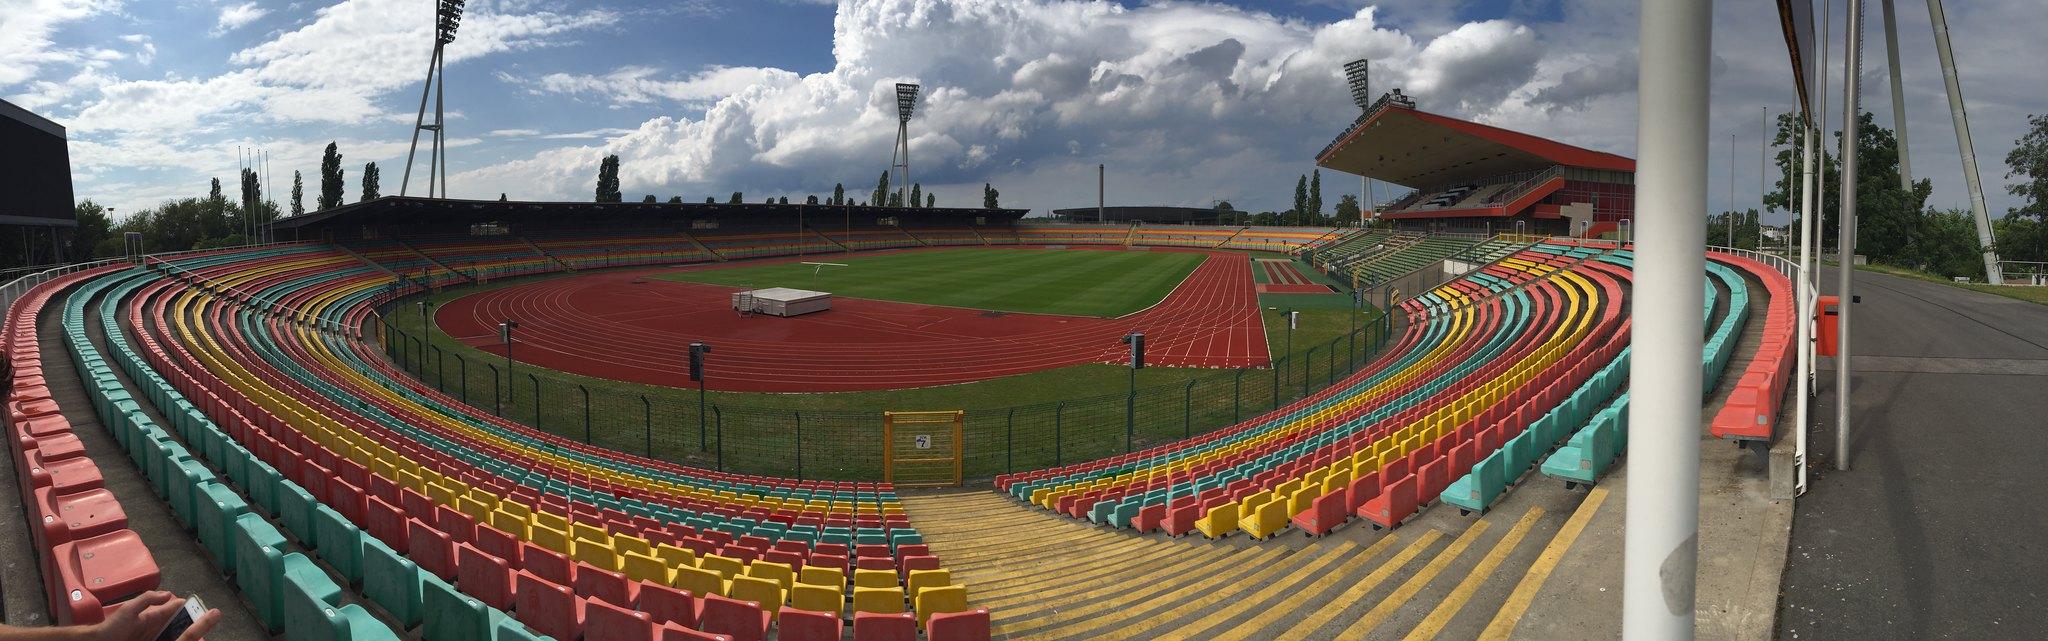 Panorama Friedrich-Ludwig-Jahn-Sportpark